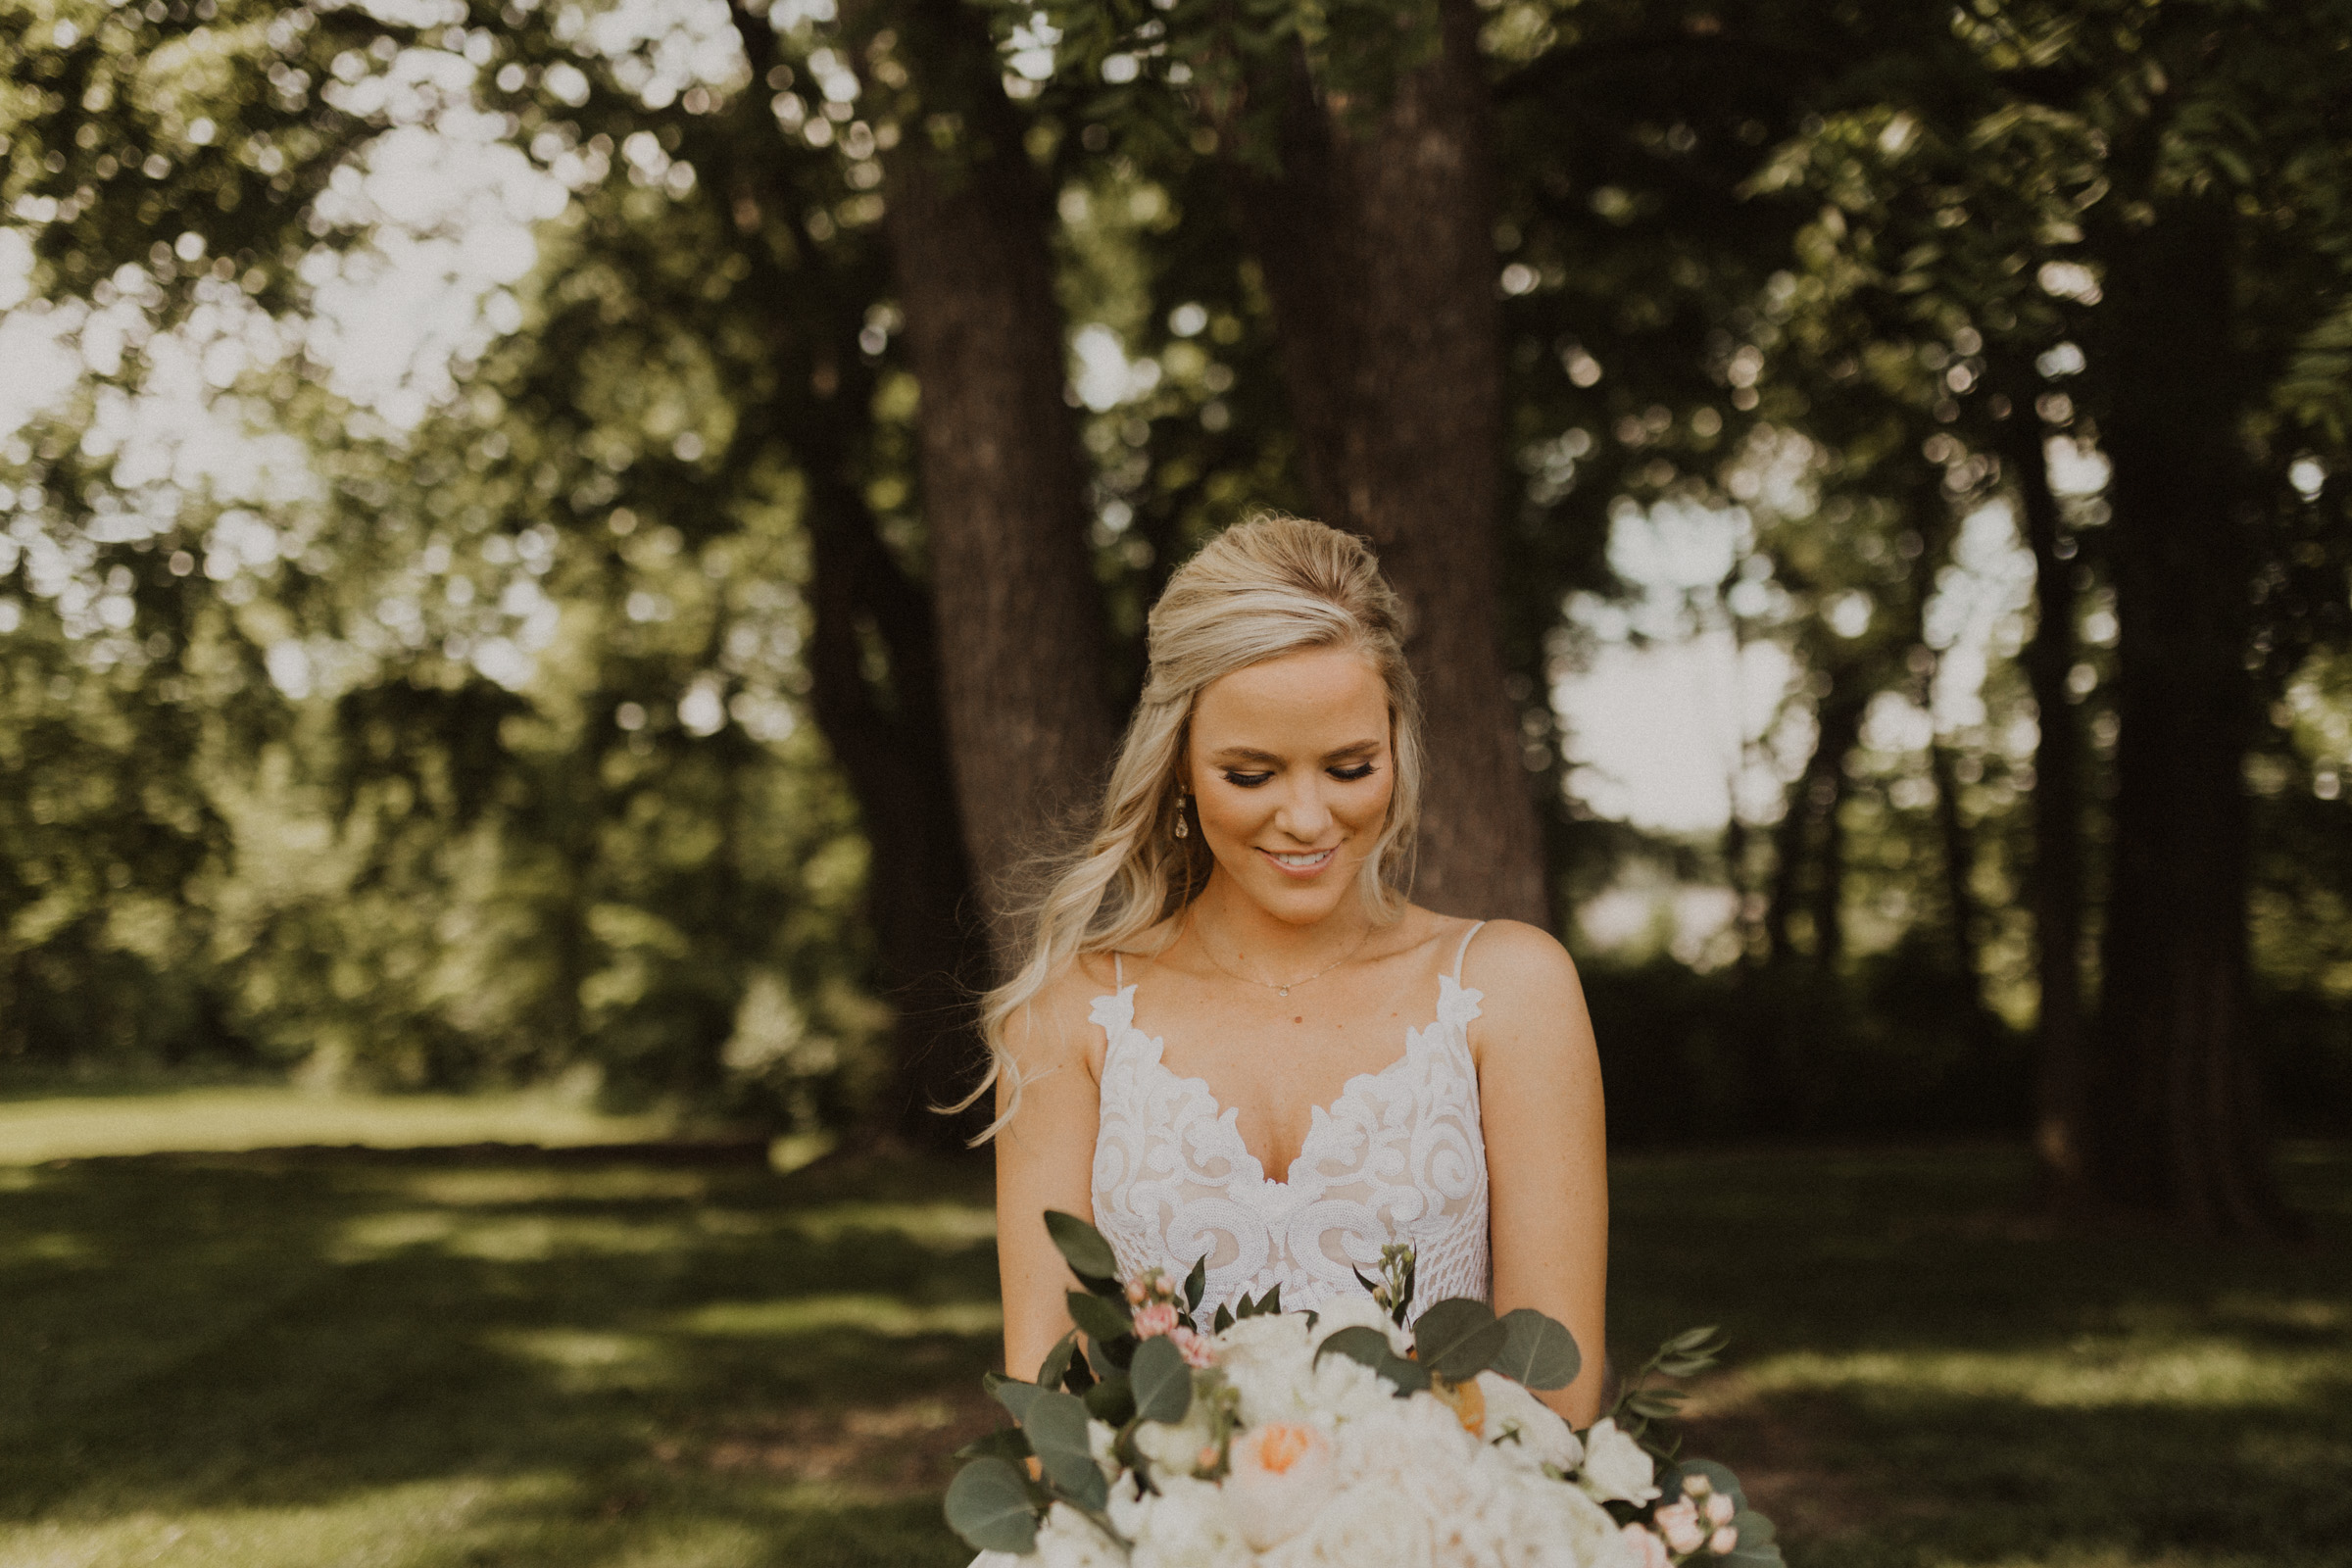 alyssa barletter photography hawthorne house summer outdoor wedding southern charm inspiration-30.jpg